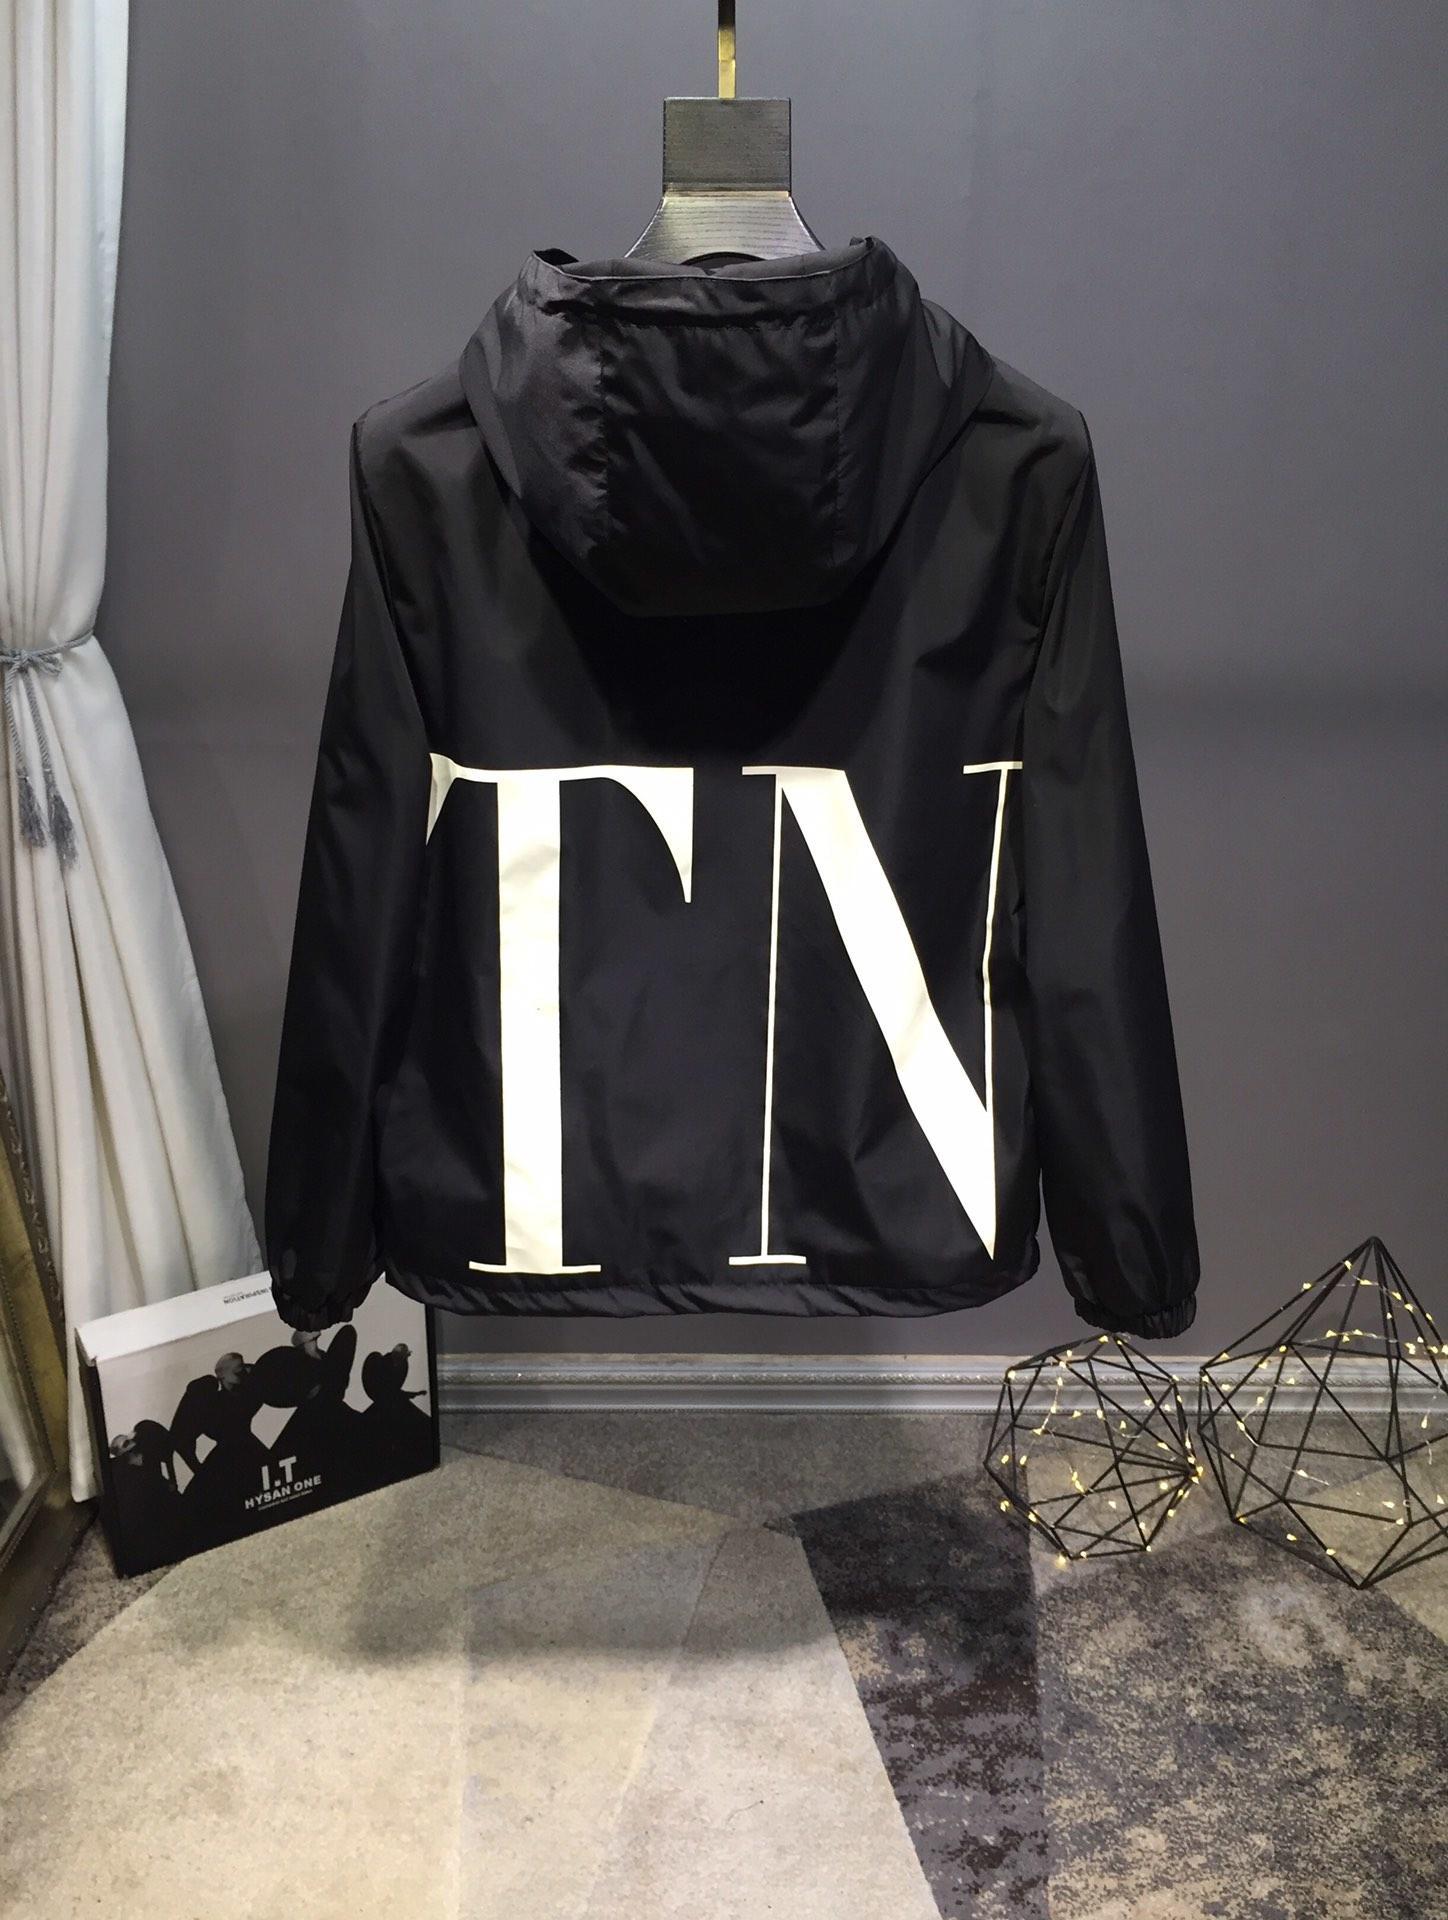 MONC#LE&XVALE#NTIN